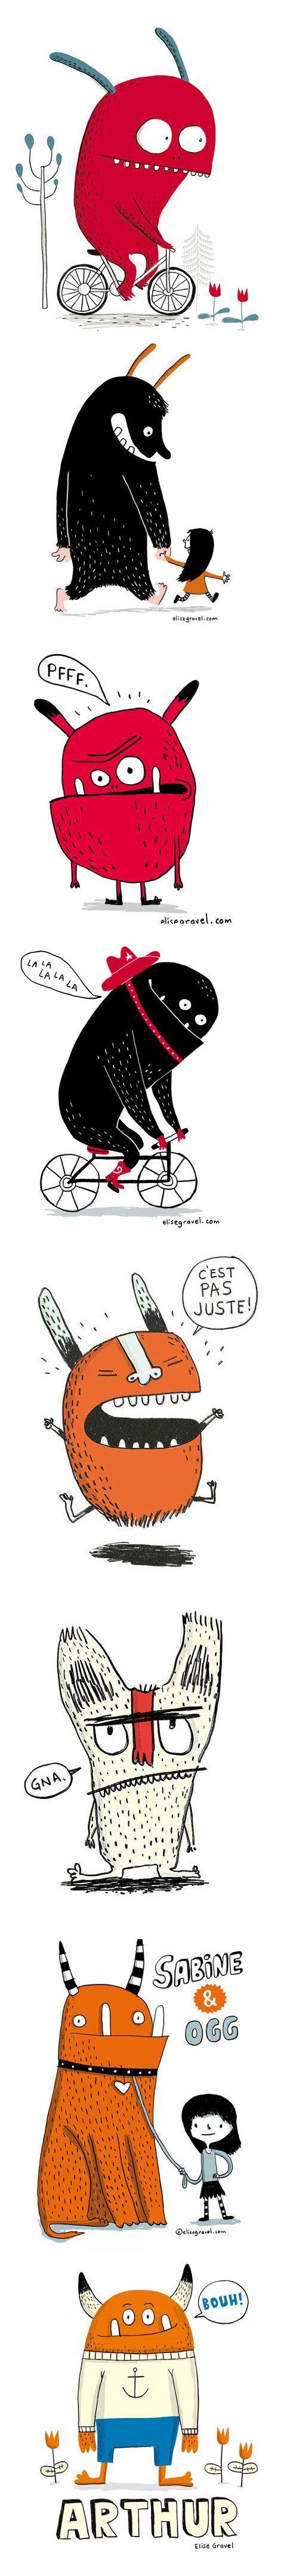 Elise Gravel • Monsters • Illustration • Characters • cute • orange • red • kids: